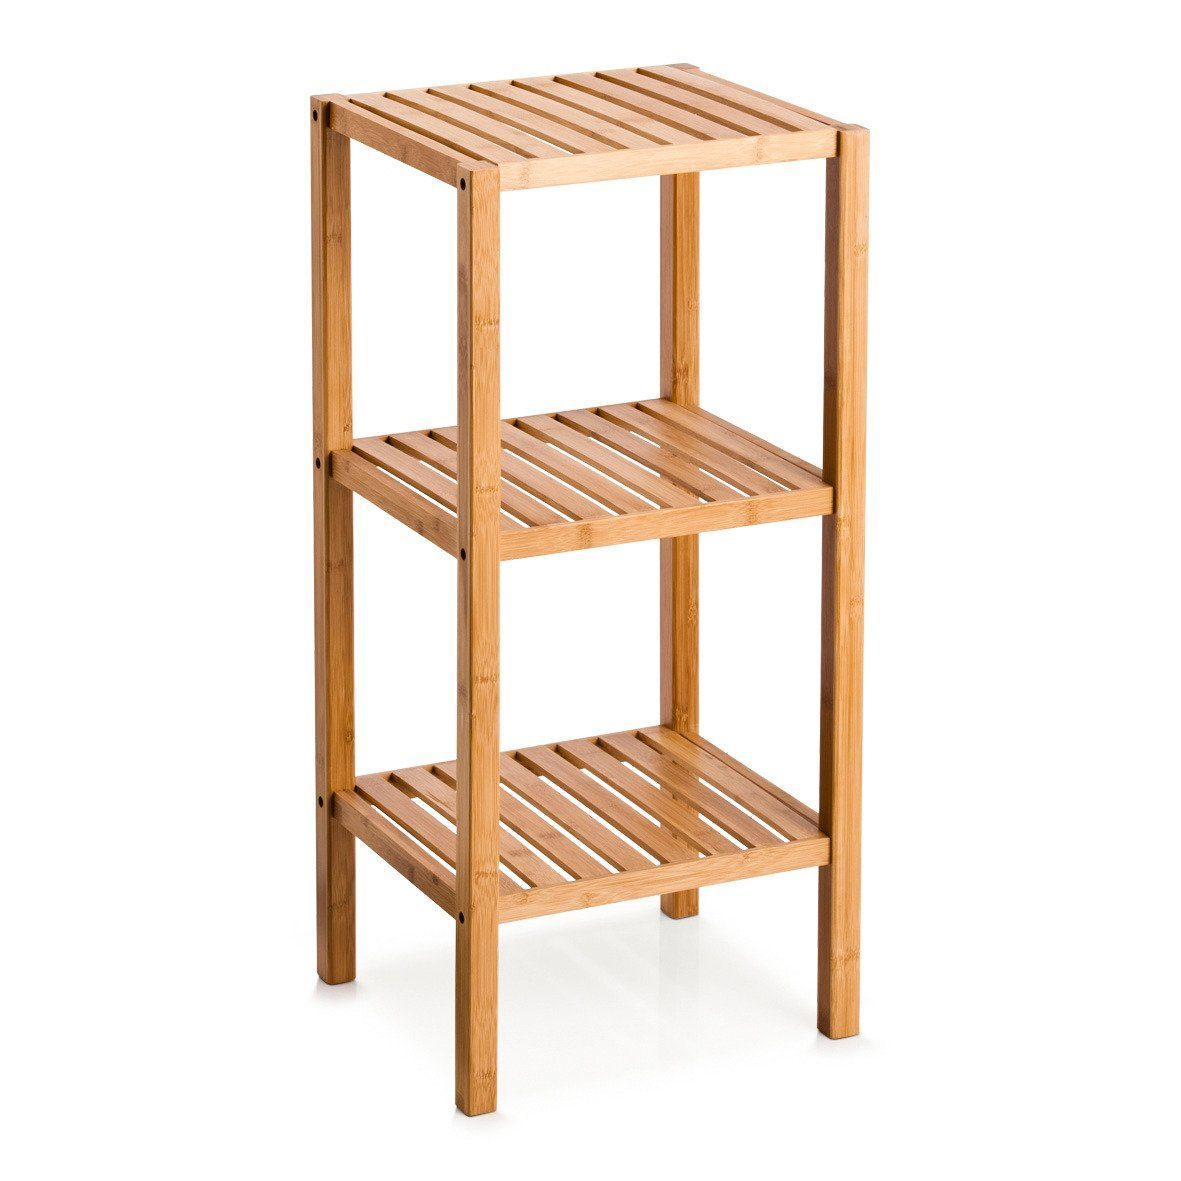 Bemerkenswert Badregale Beste Wahl Badregal »bamboo« Neutural Kaufen Otto